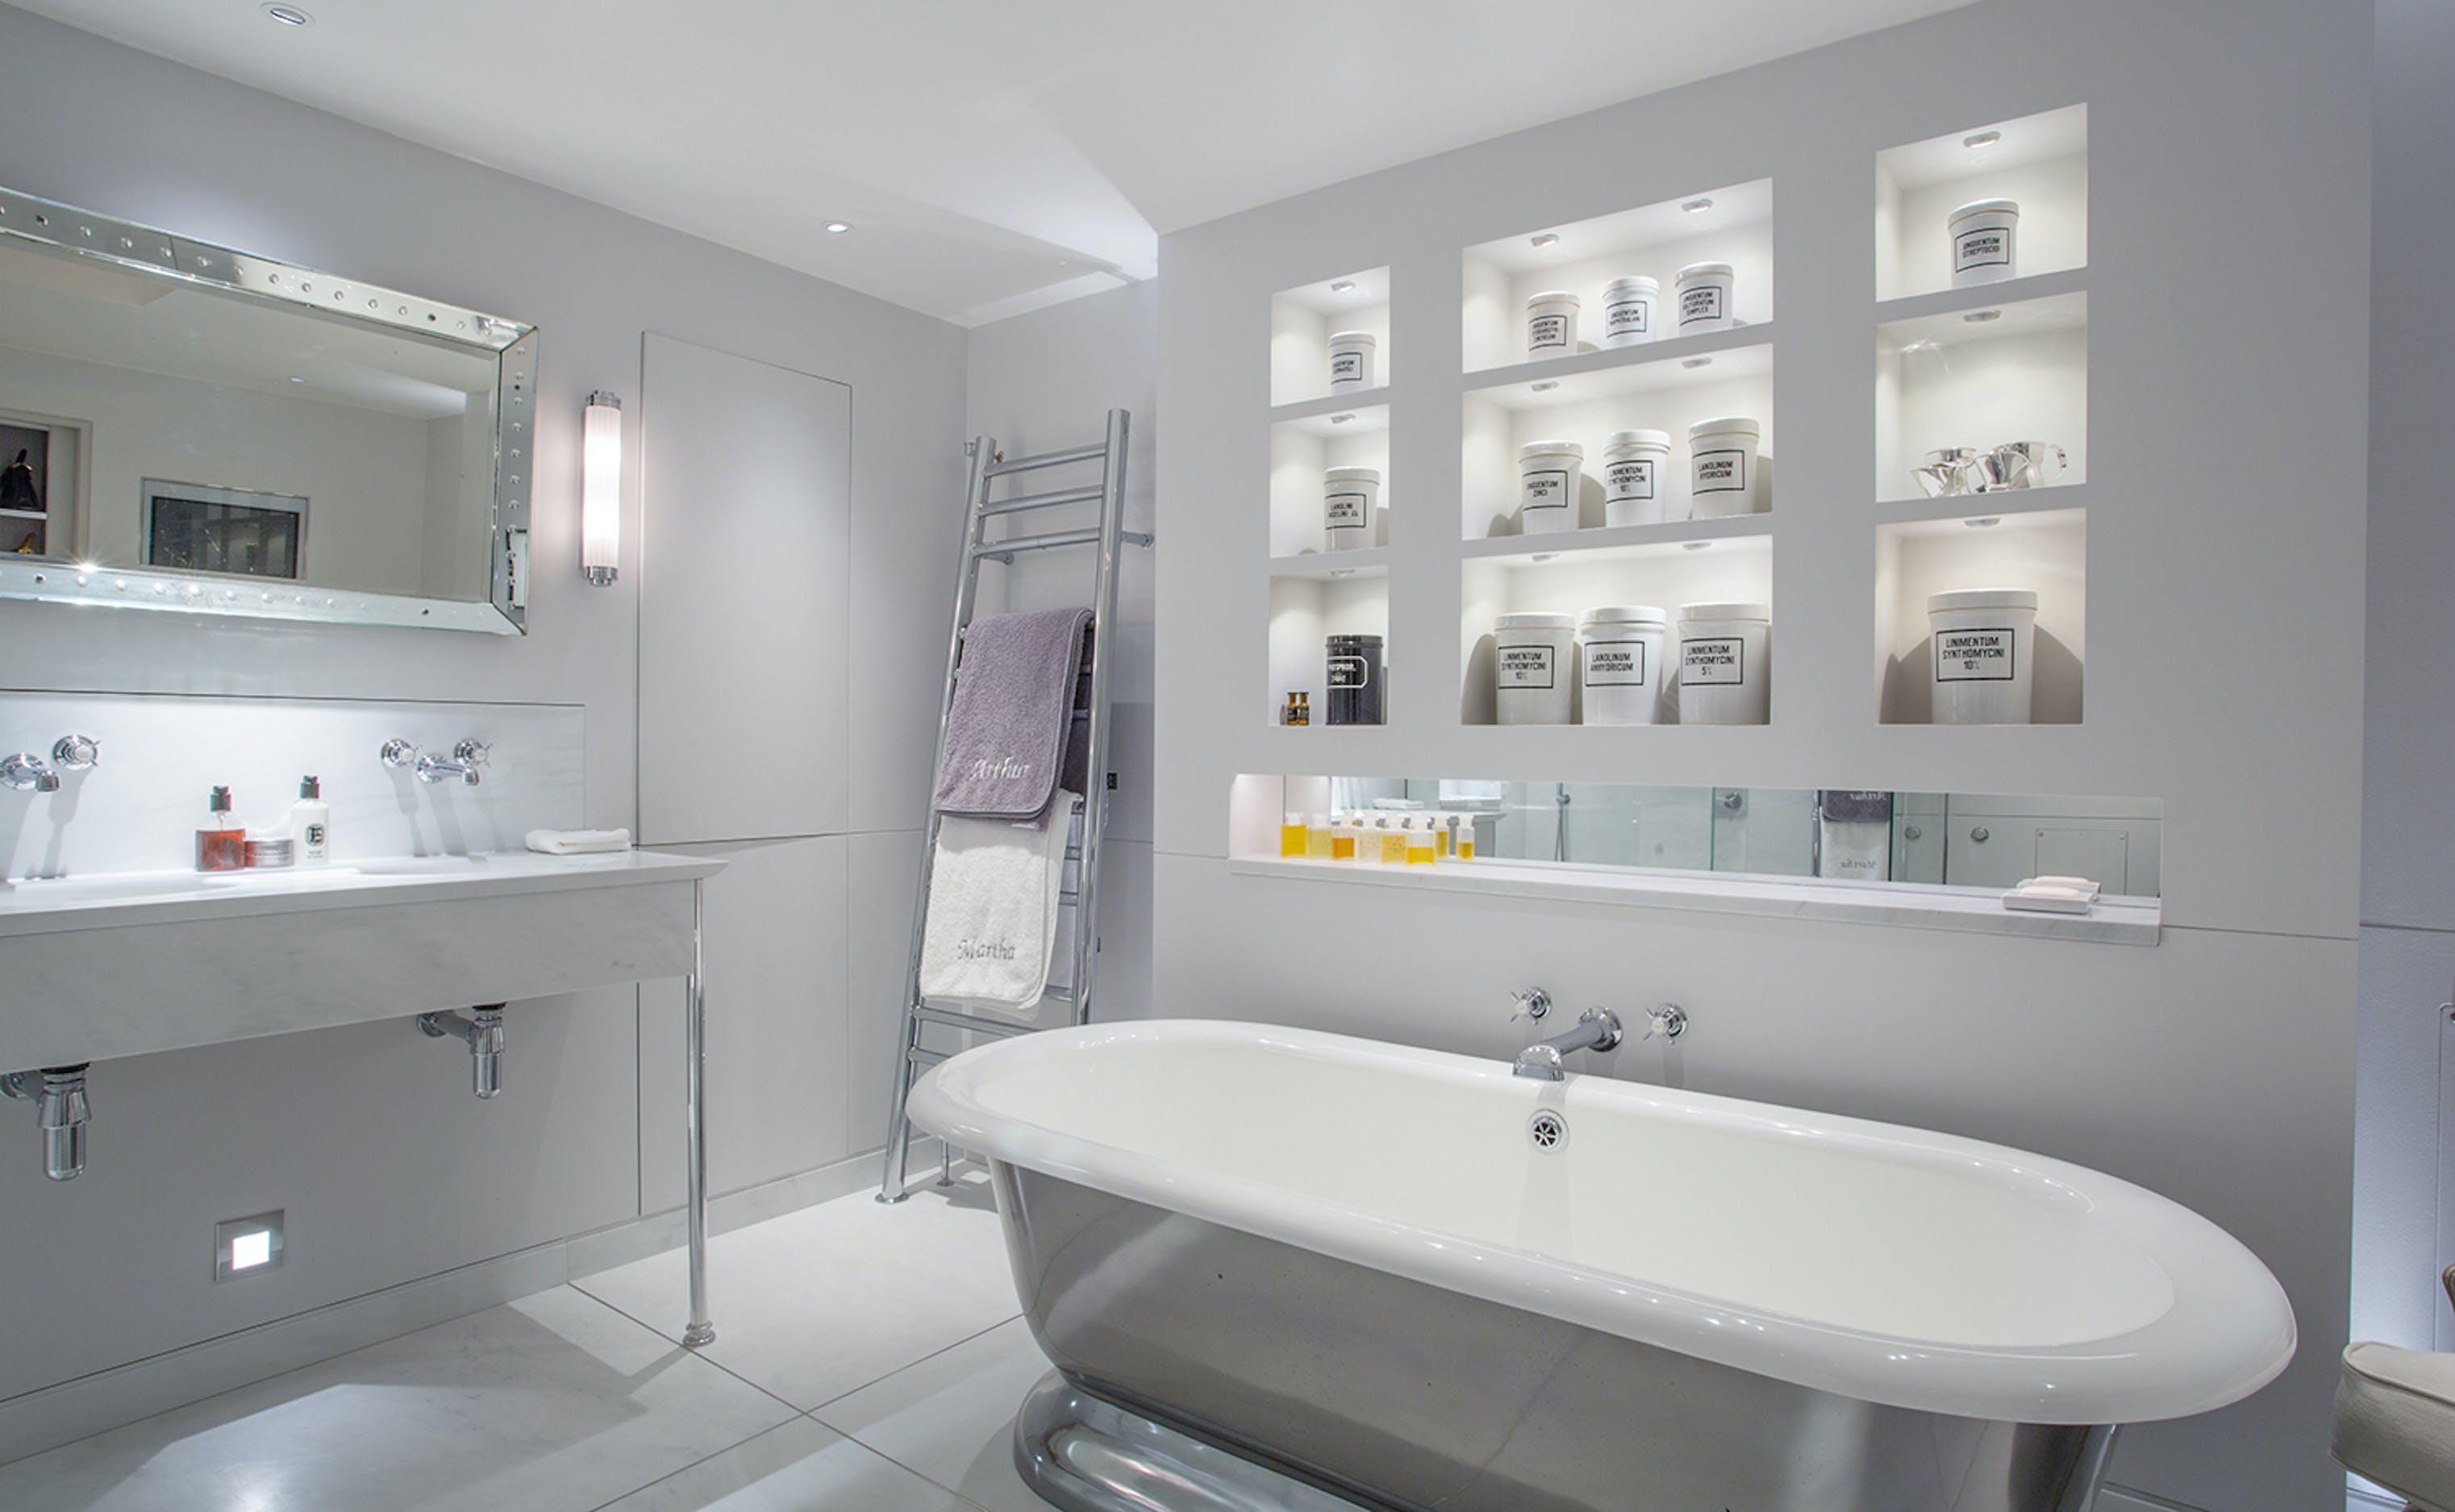 Layered bathroom lighting